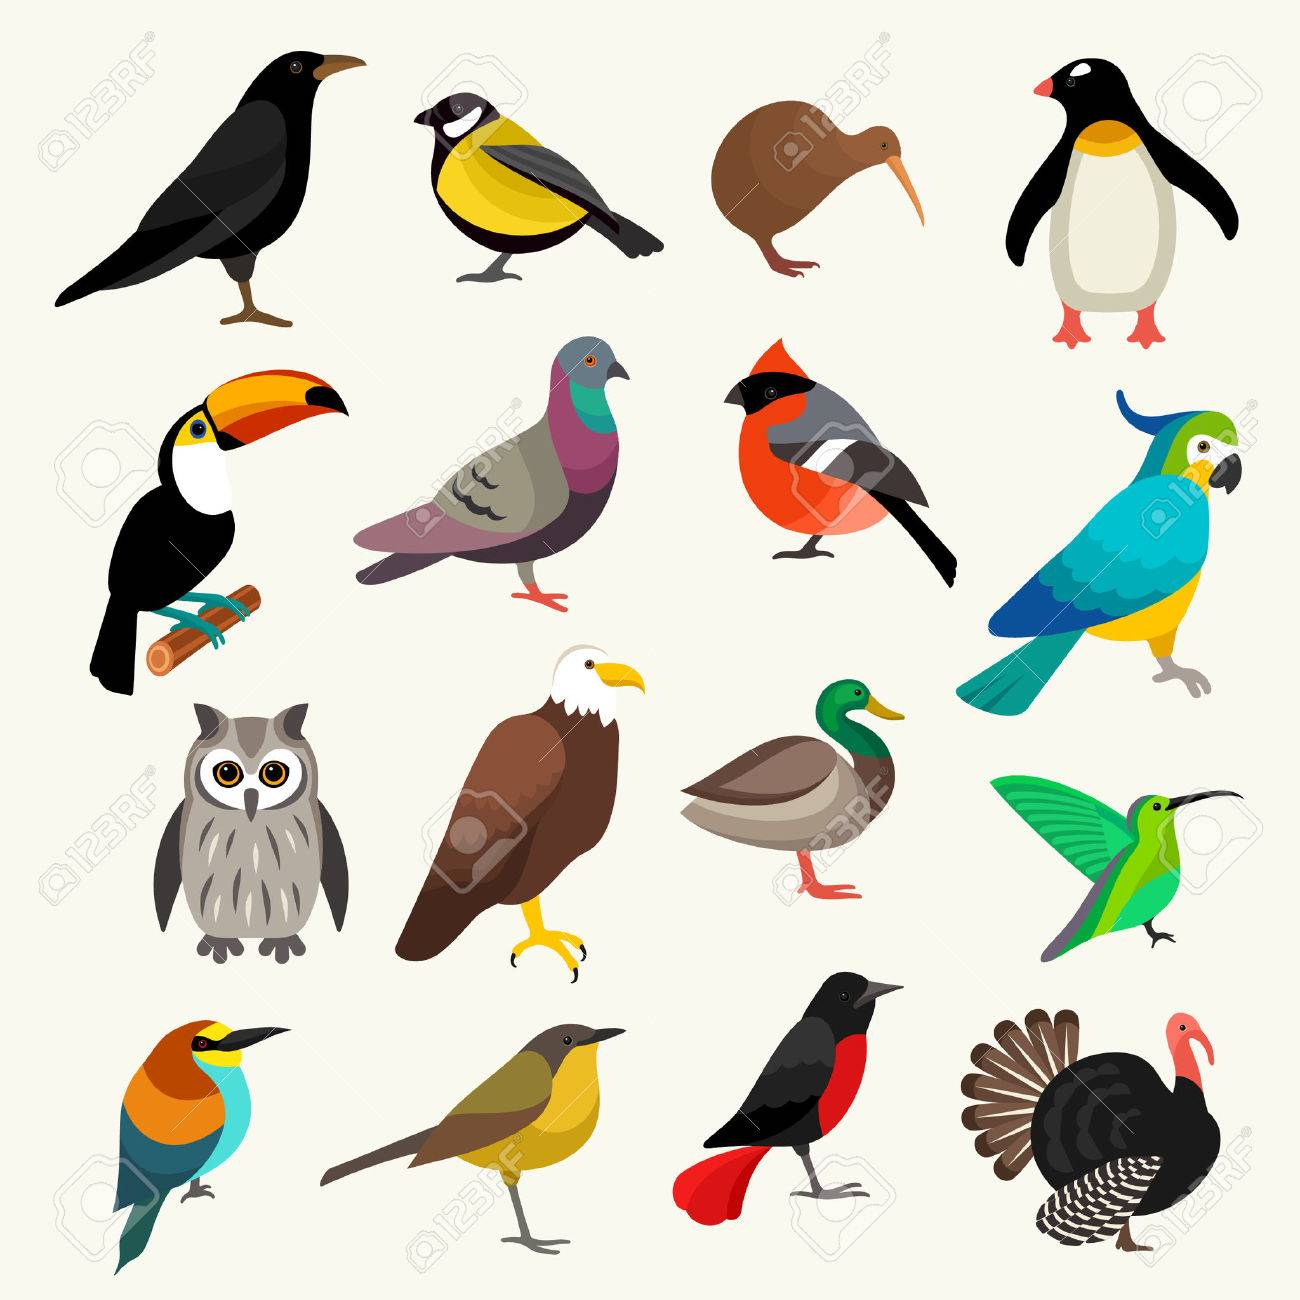 birds - 52359034